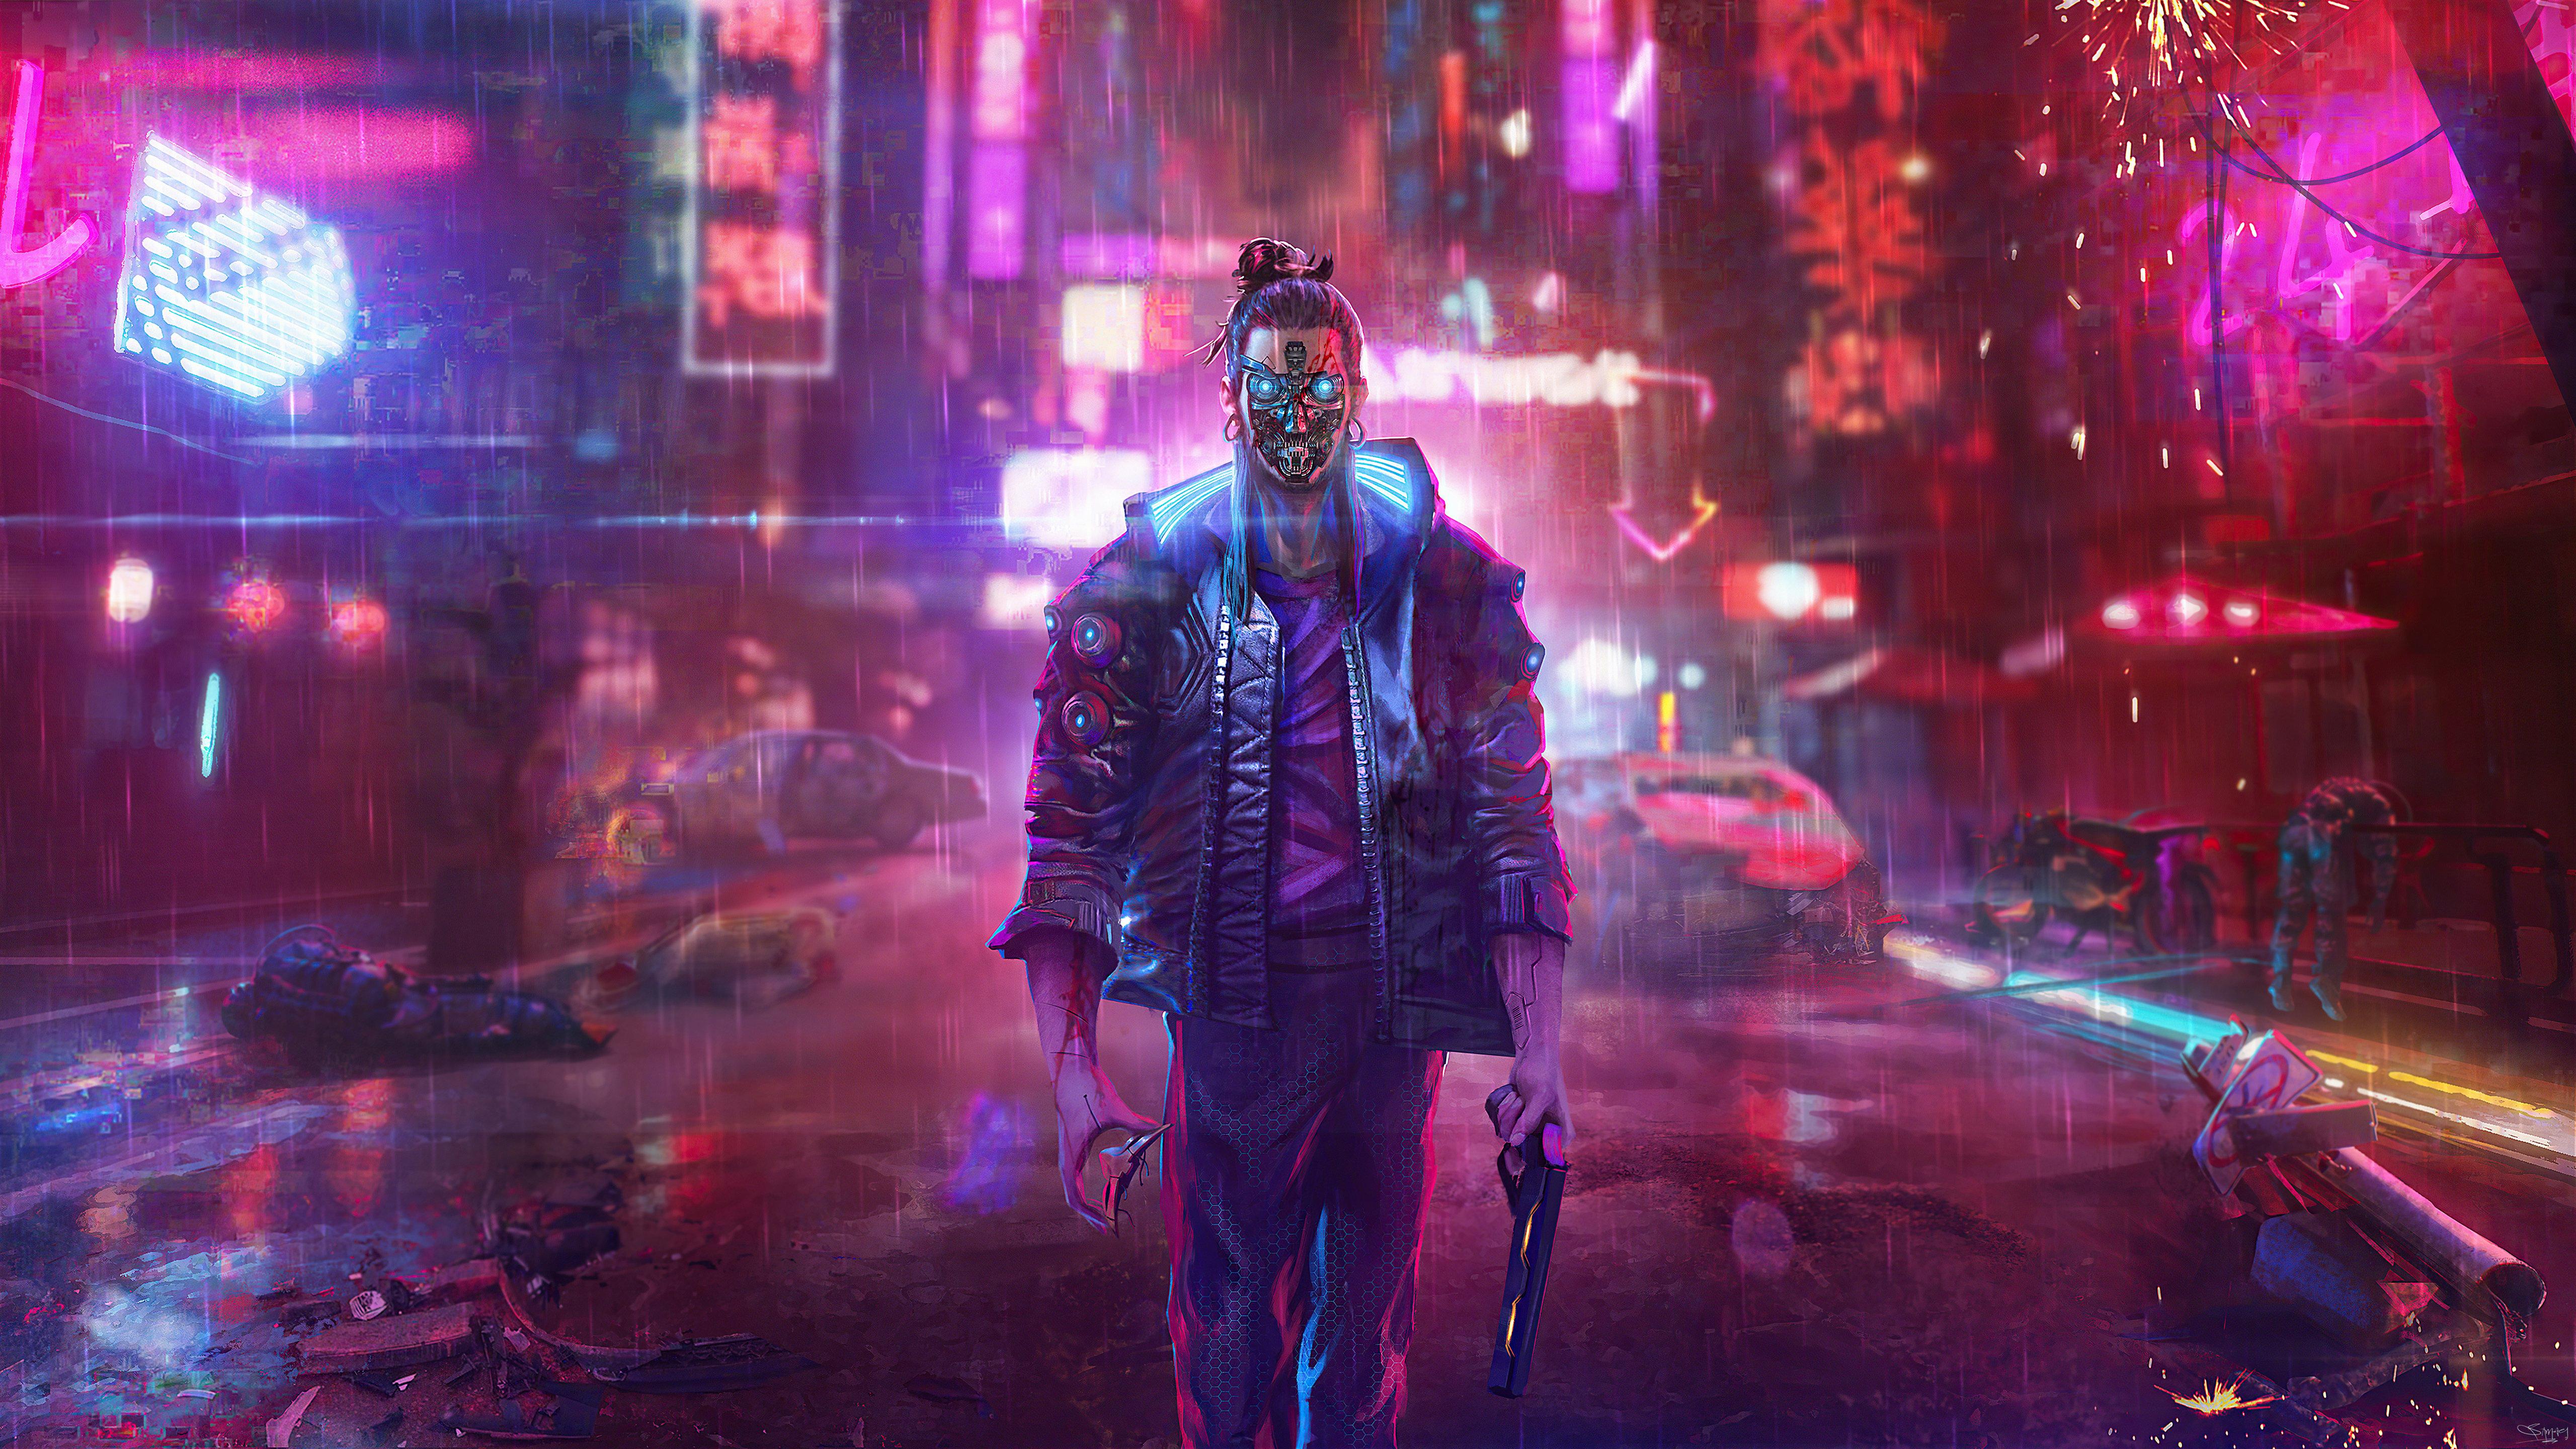 Wallpaper Man in the city Cyberpunk 2077